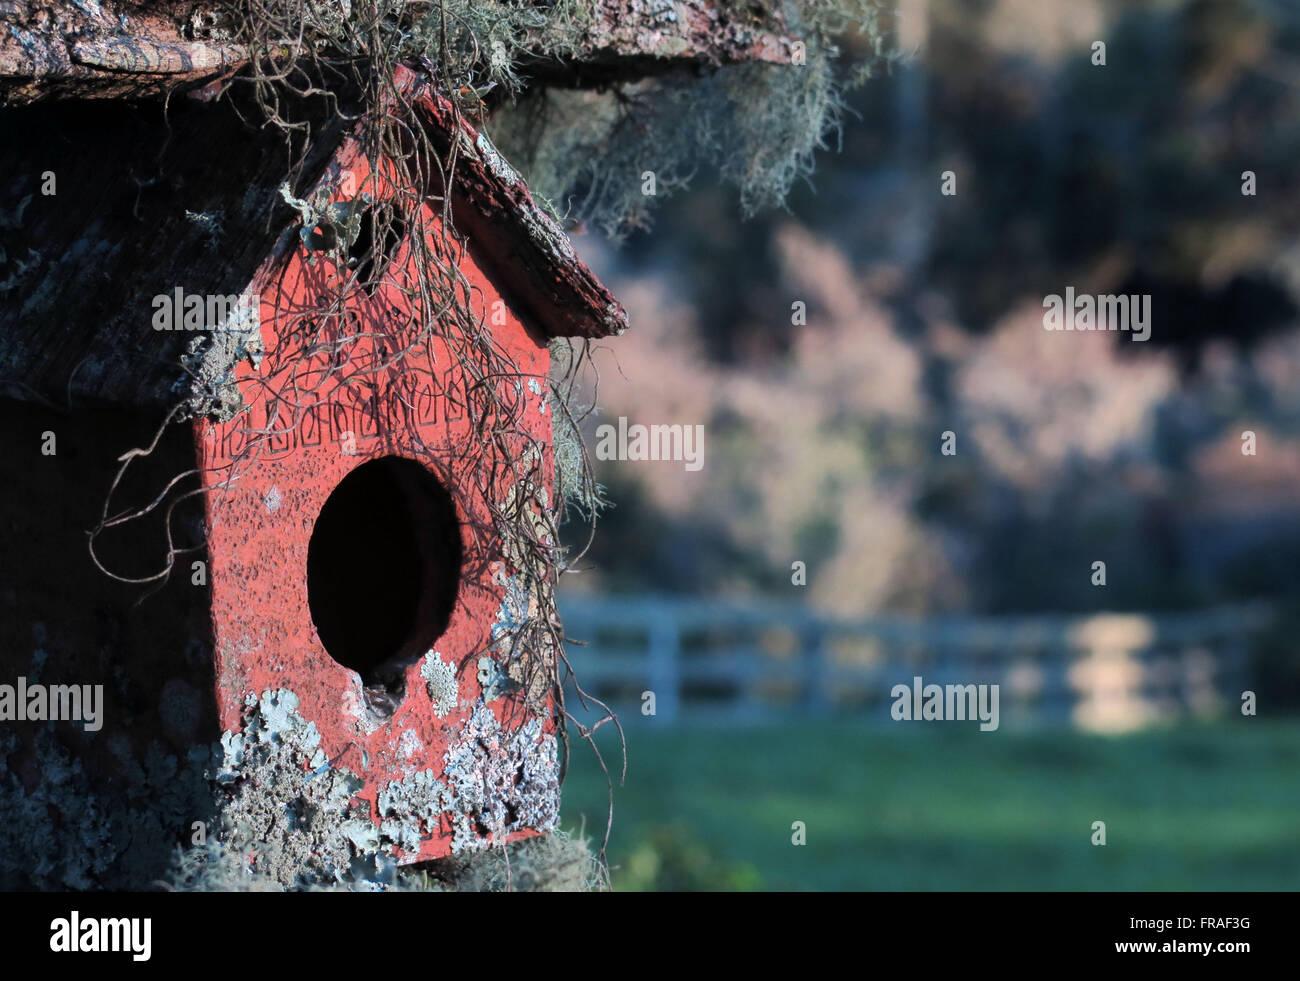 Birdhouse with beard of nerve or beard-of-old - Lageado Grande district - Stock Image